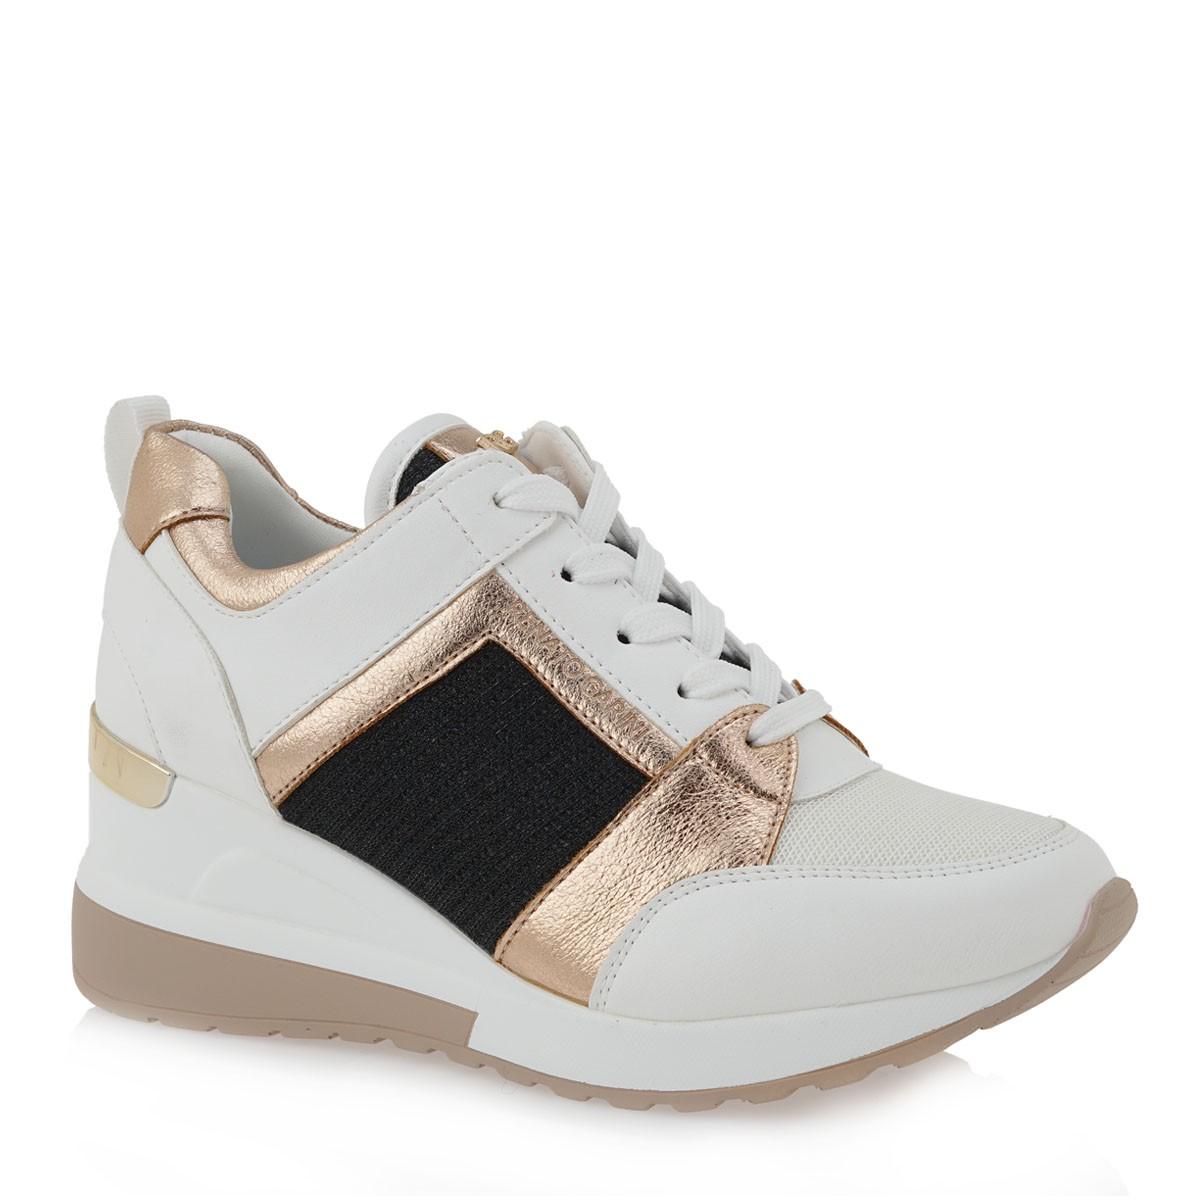 Renato Garini Γυναικεία Παπούτσια Sneakers 012-EX2131 Λευκό-Μπρονζέ-Μαύρο K119R012384K